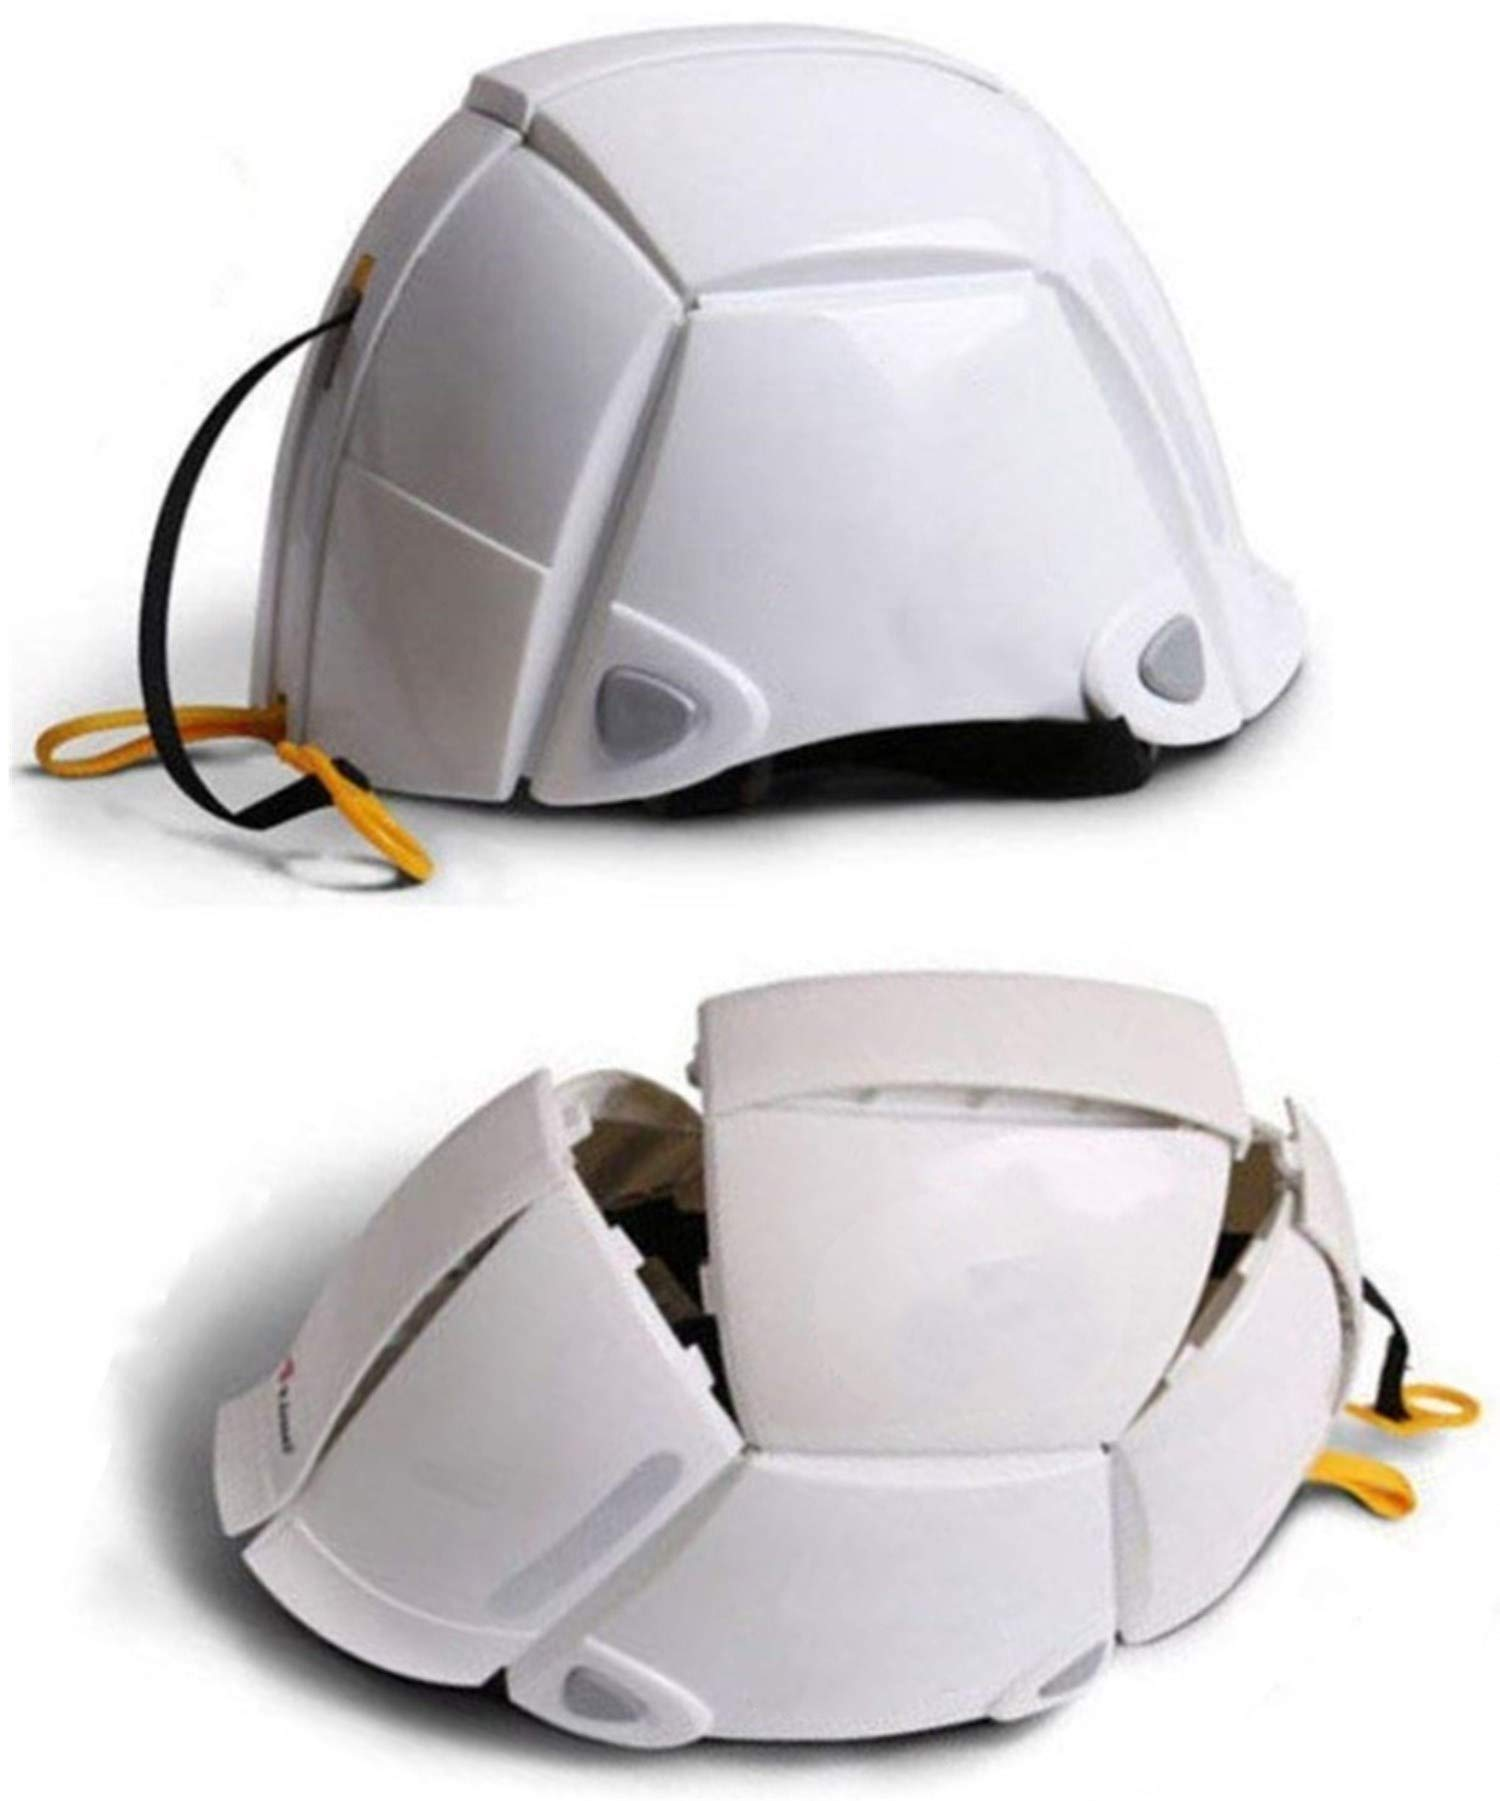 Folding Safety Helmet Bloom Outdoors Workplace Earthquake Helmet Offices Public Facilities of Disaster Helmet Hardhats